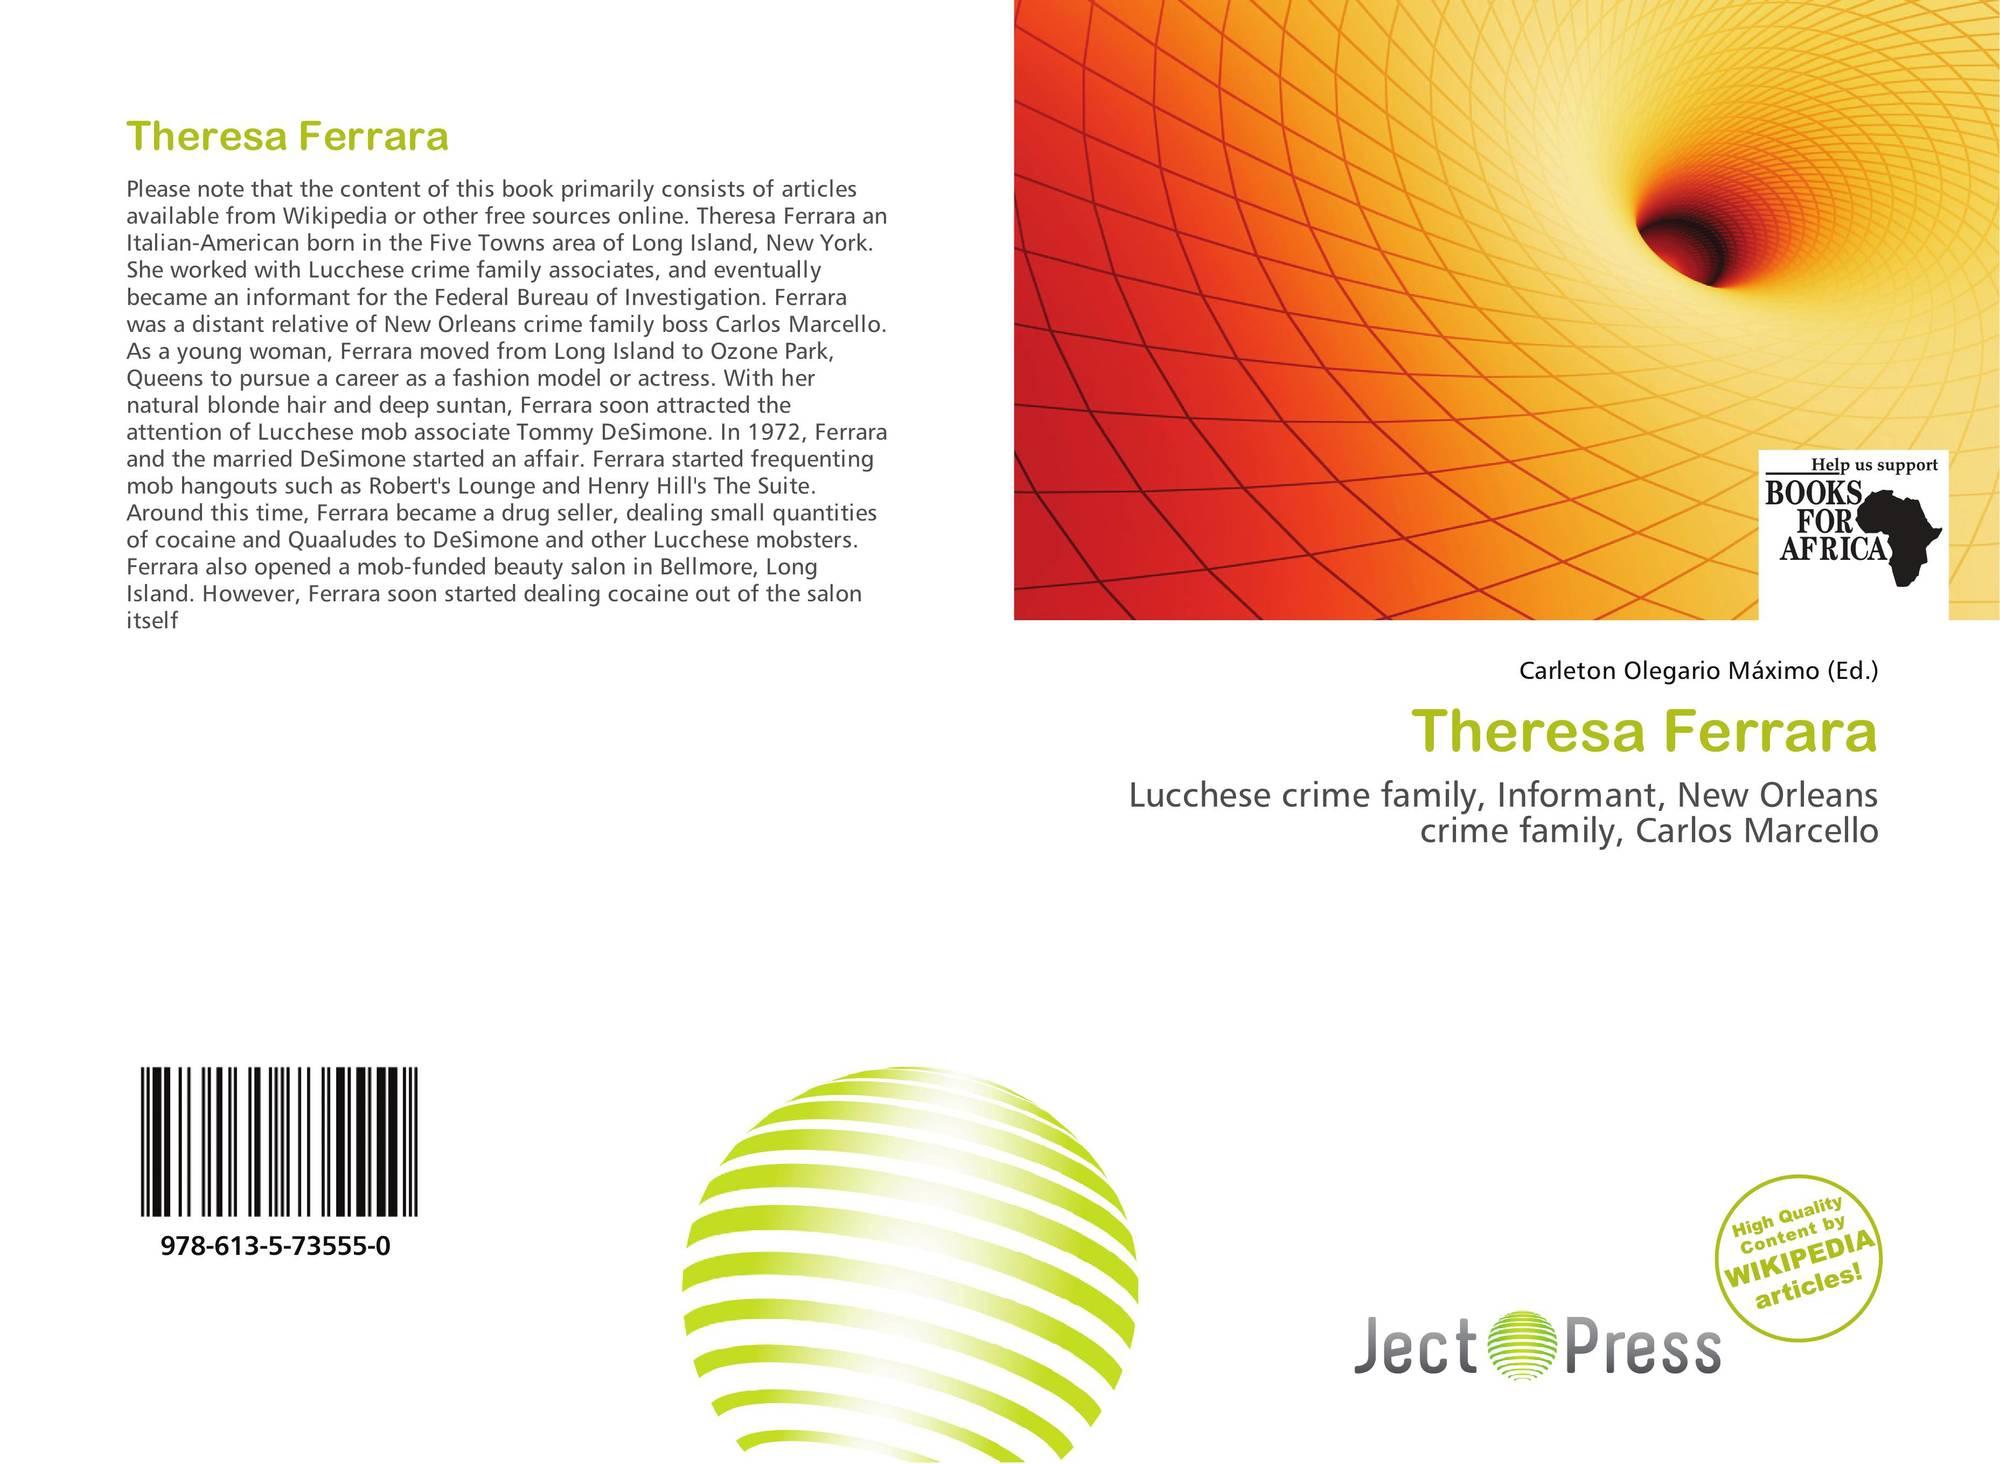 bookcover of theresa ferrara omni badge theresa ferrara lucchese crime family